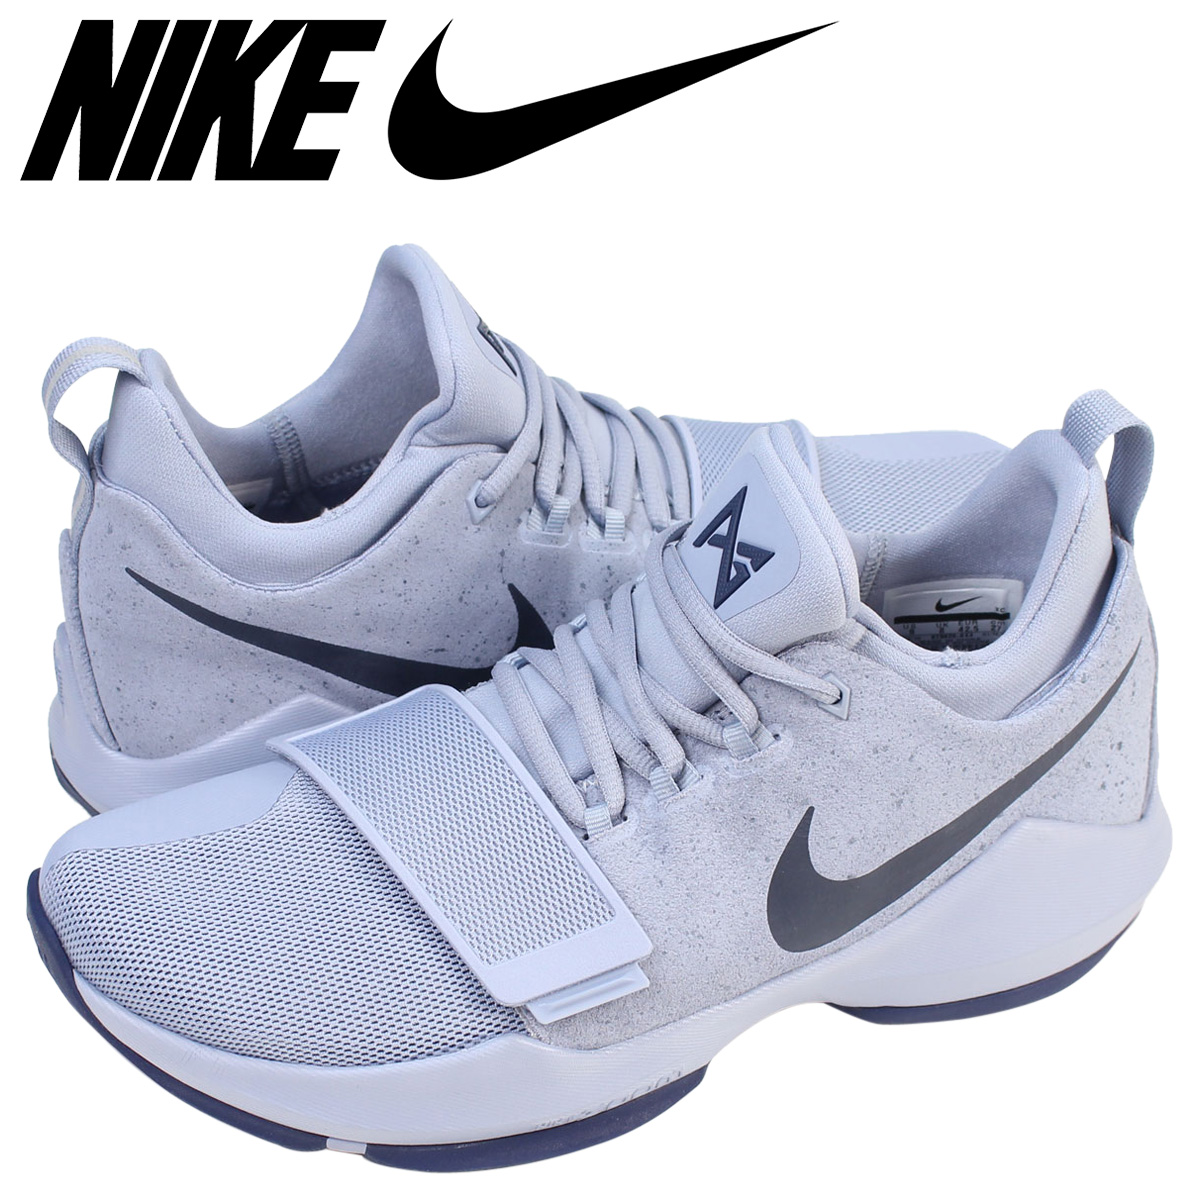 NIKE ナイキ PG1 スニーカー PG 1 EP 878628-044 メンズ 靴 グレー 【zzi】